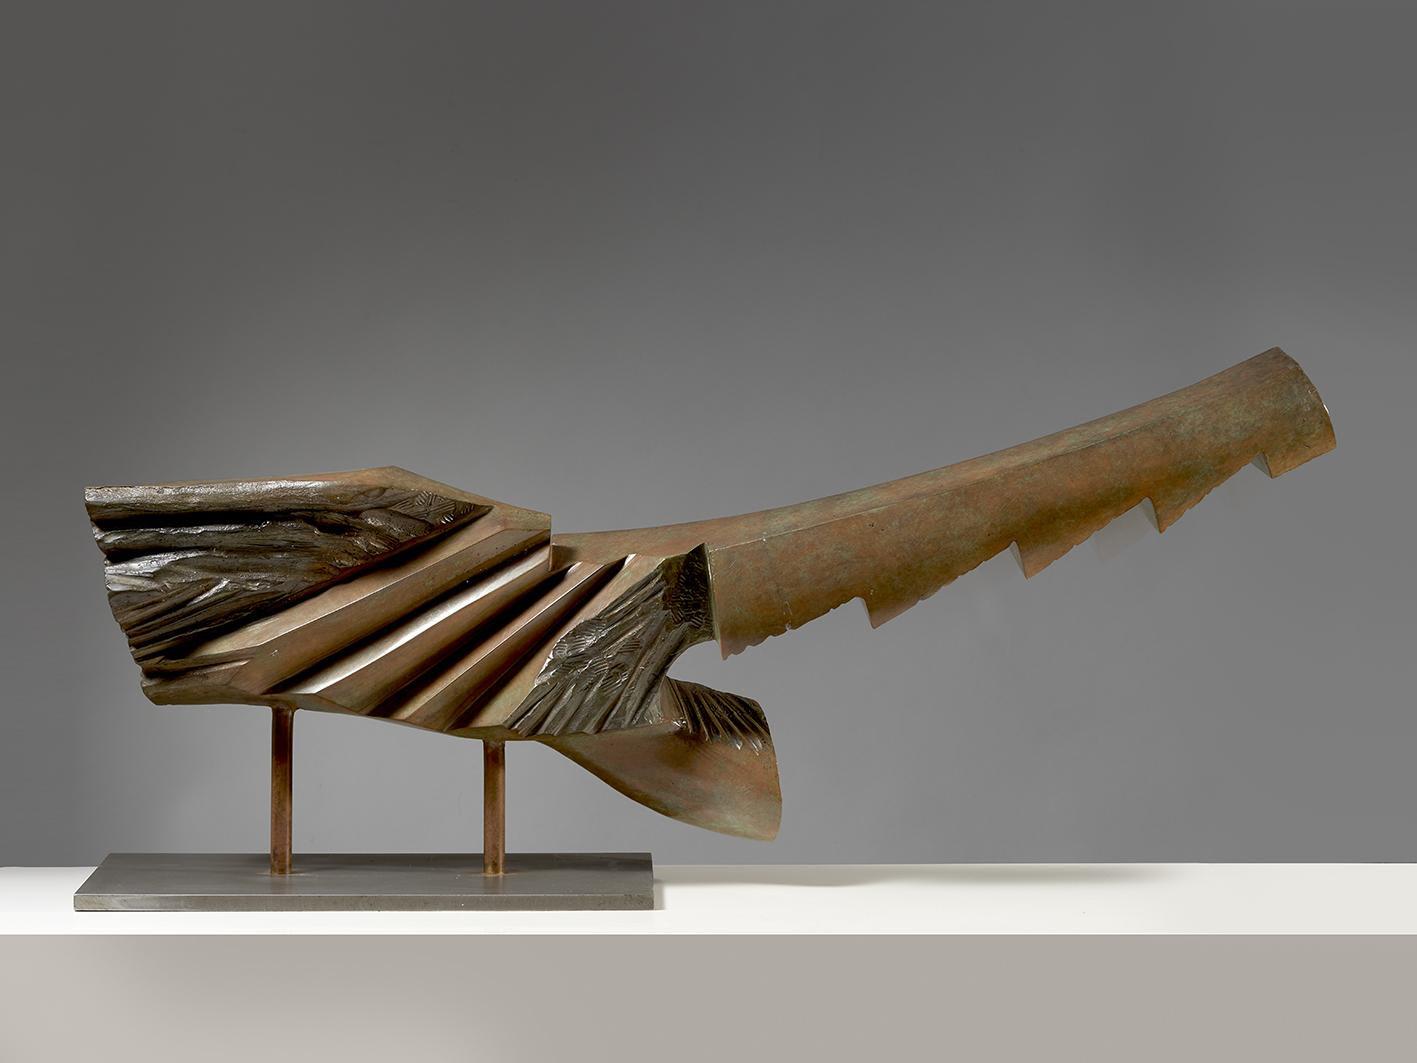 Guido Pinzani, Nuotatrice, 1990, bronzo, esemplare unico, cm 42x93x18